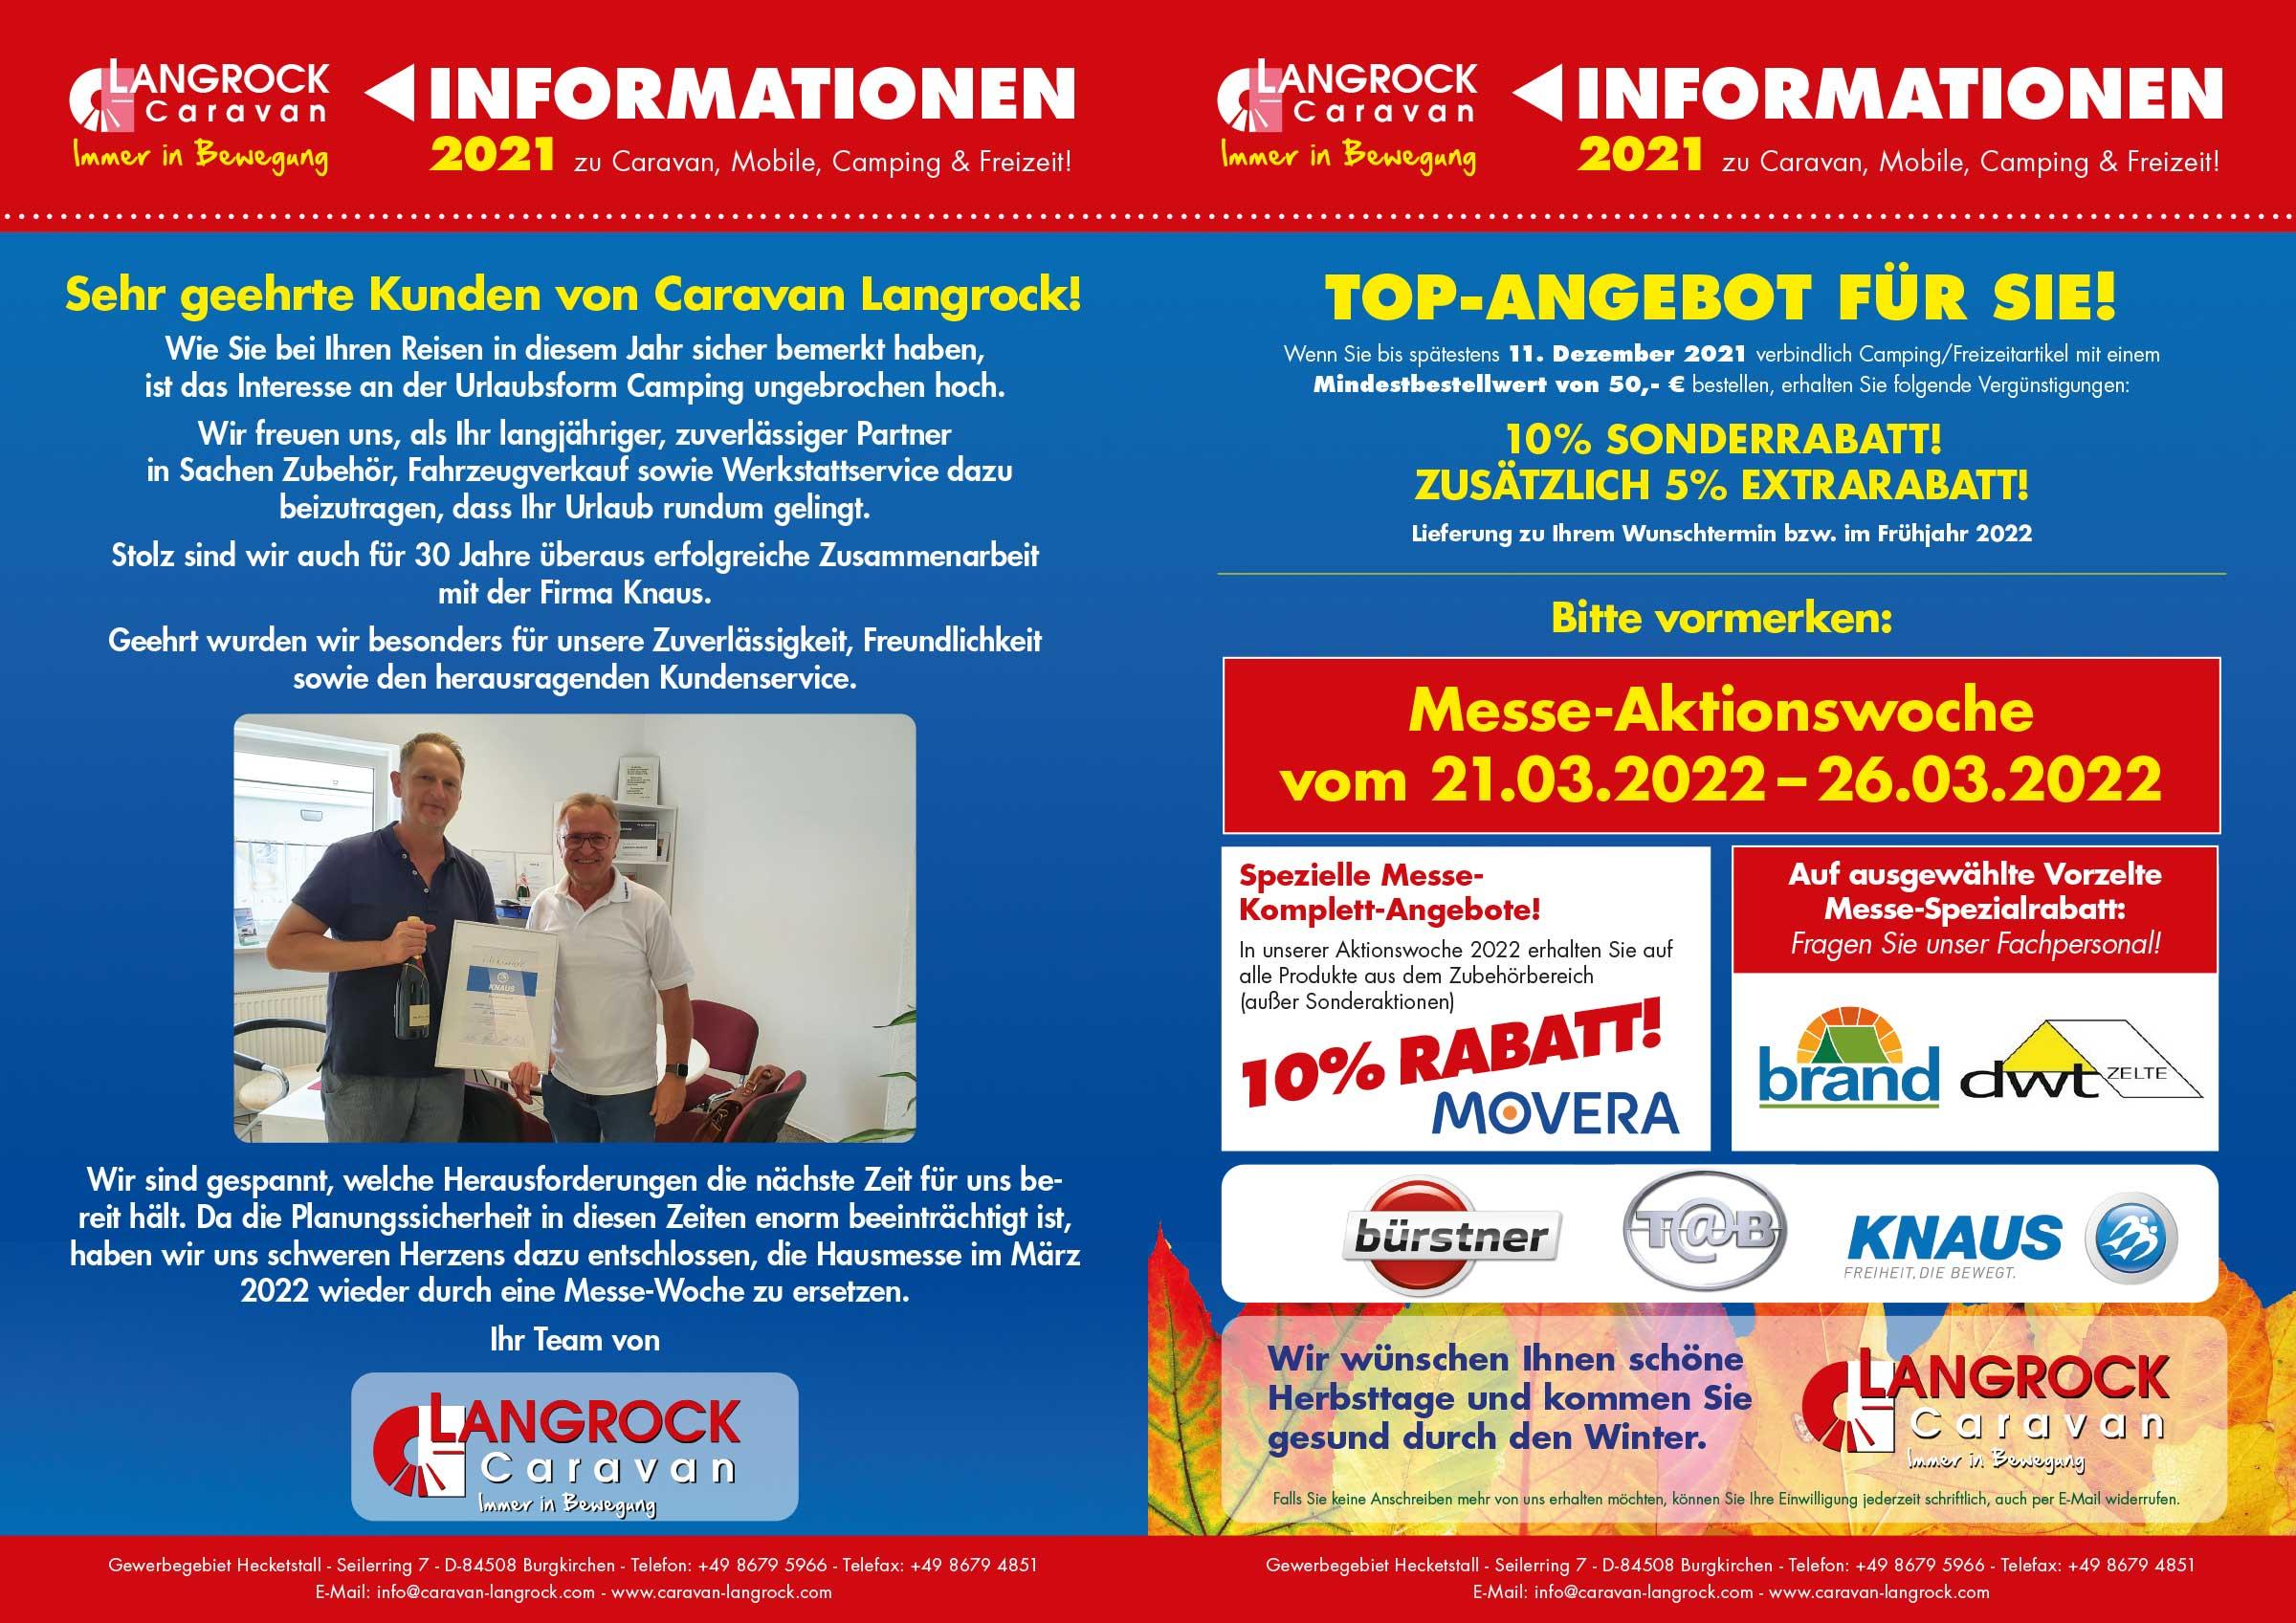 211012 Langrock Broschuere 2stg 2